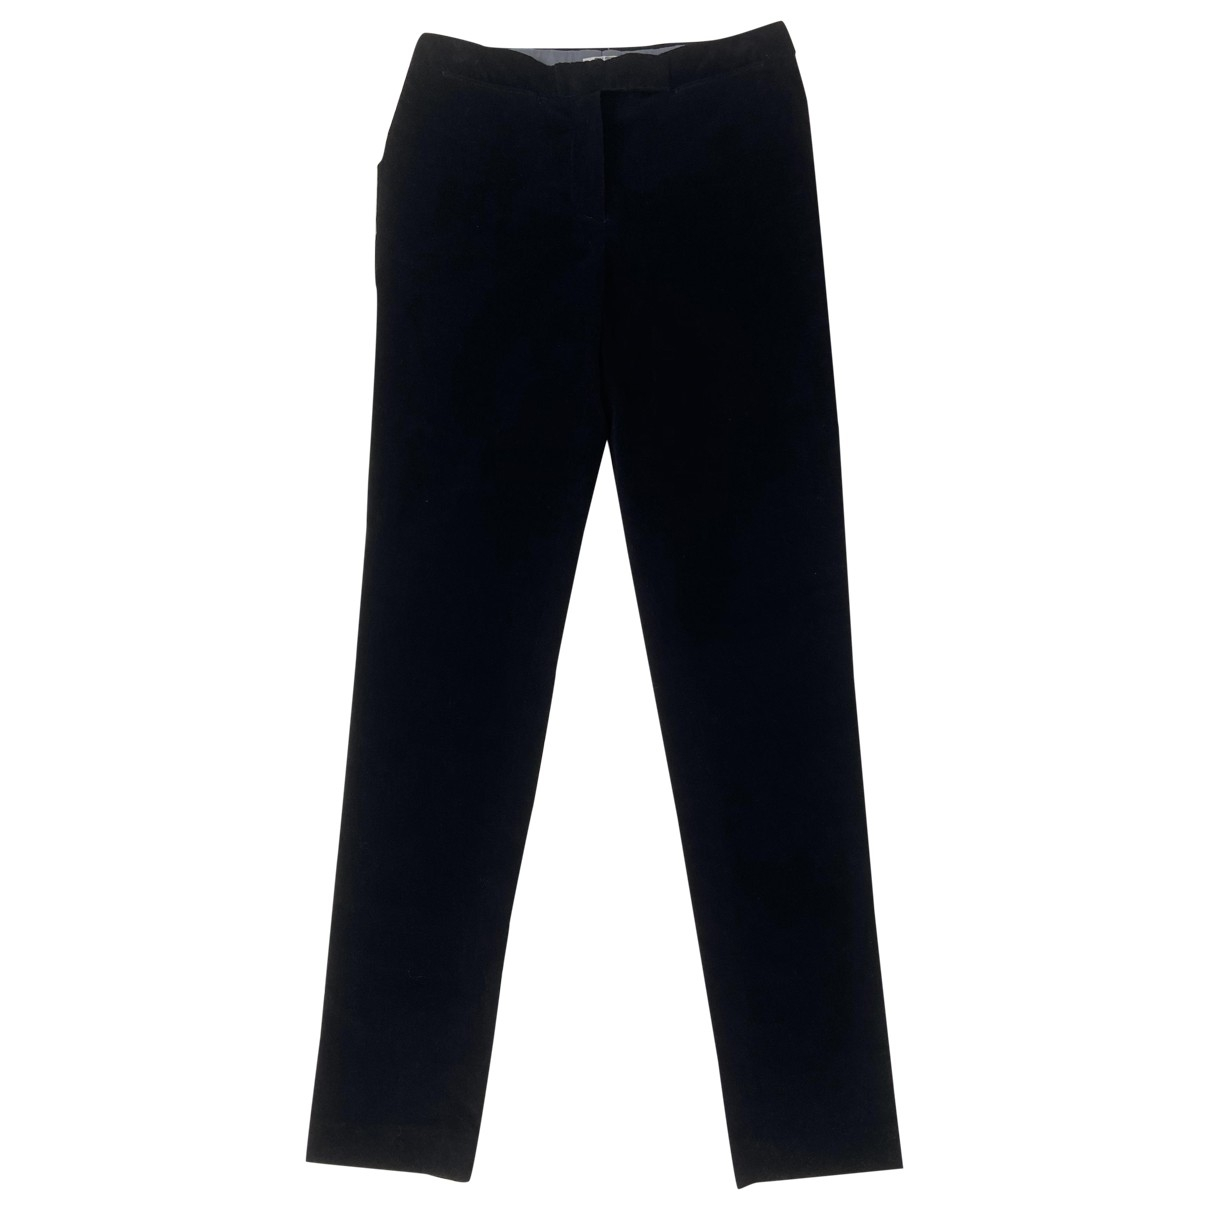 Miu Miu \N Black Velvet Trousers for Women 38 IT